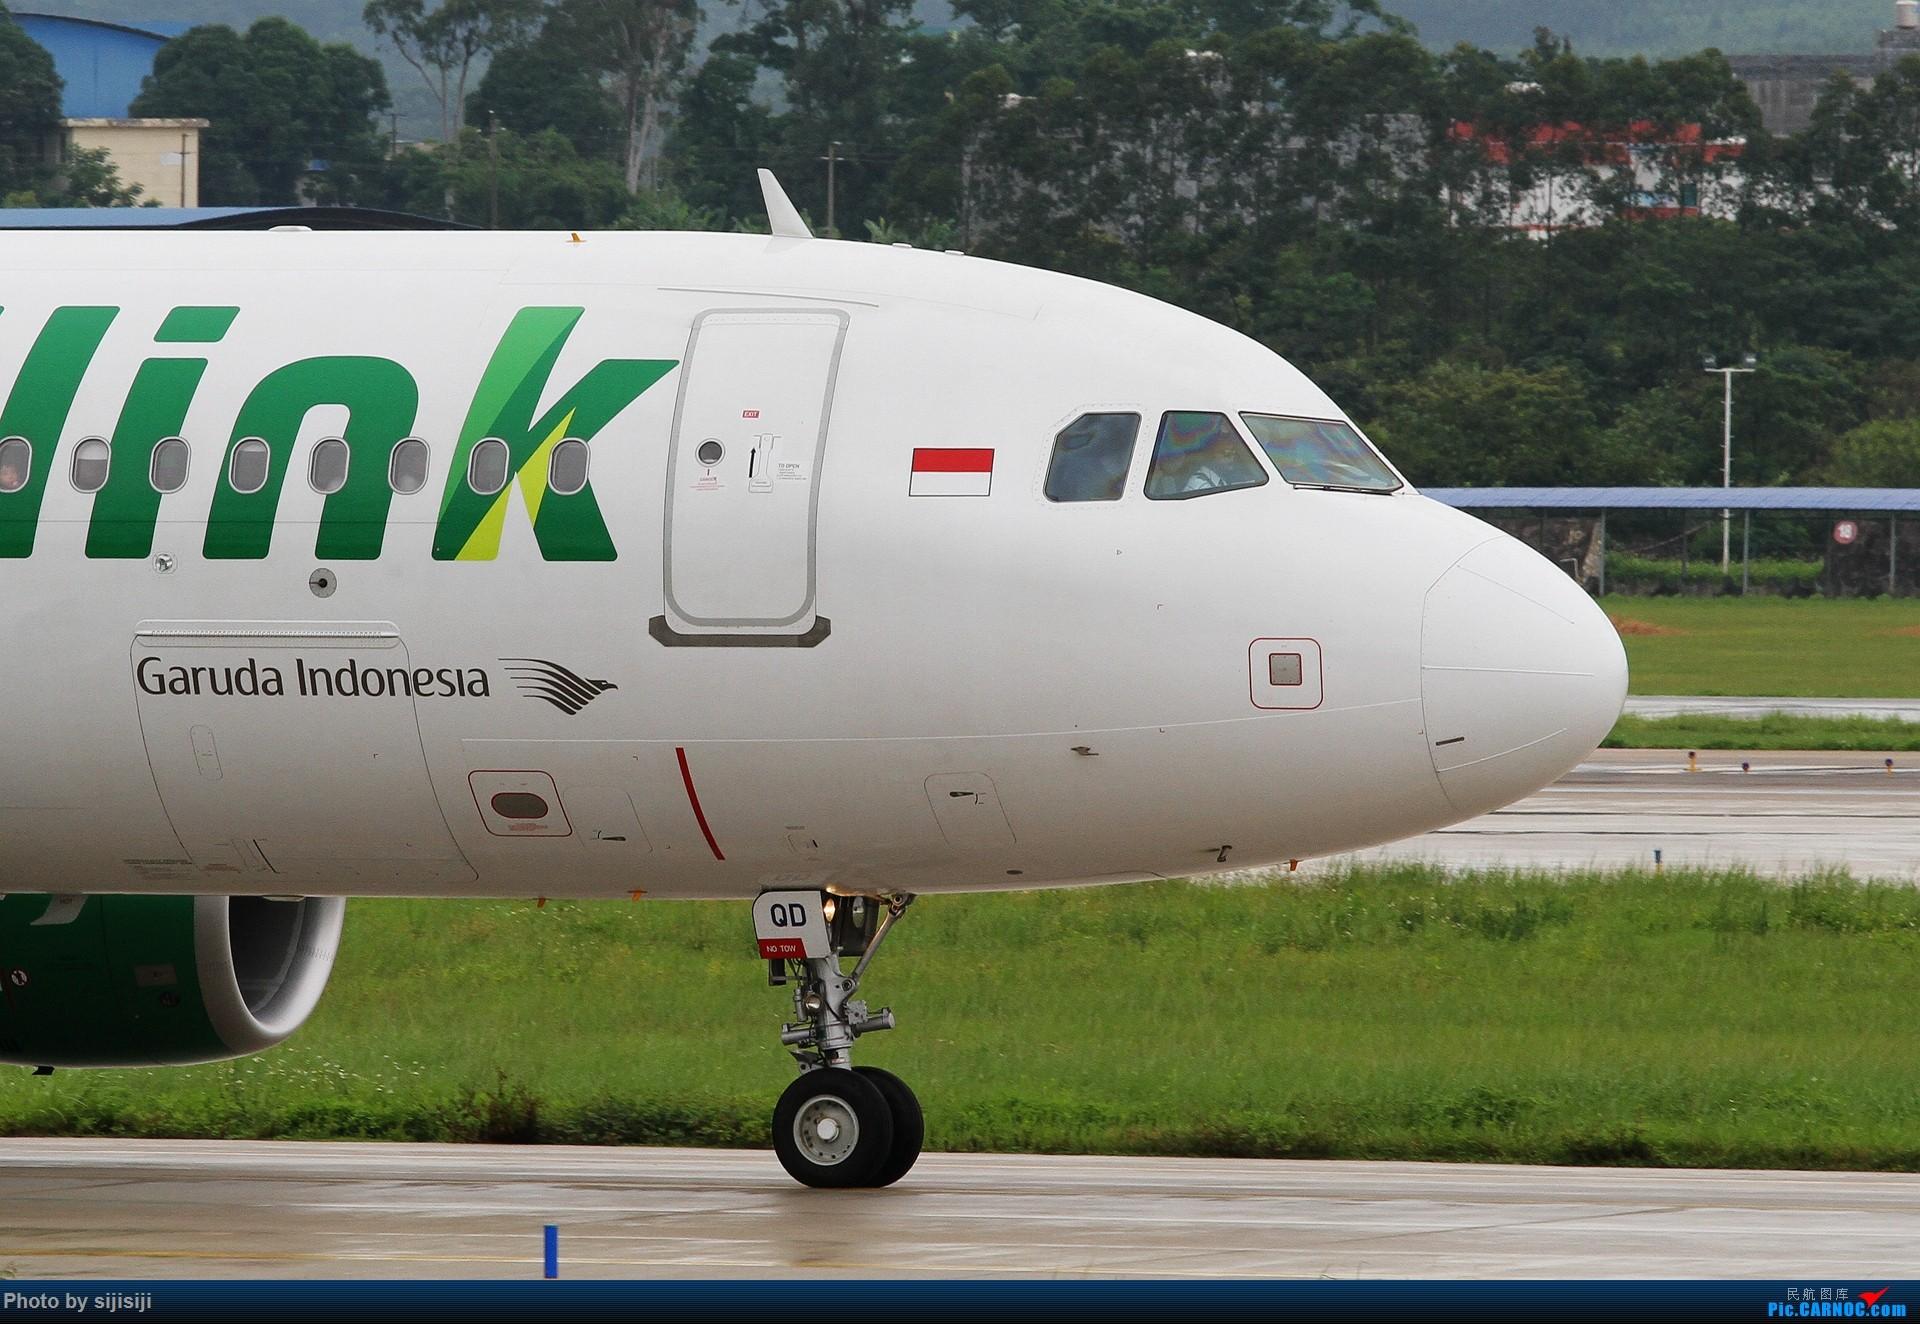 Re:[原创]【NNG飞友星星随拍】NNG的稀客:我来自雅加达,俺爹是嘉鲁达 AIRBUS A320-200 PK-GQD 中国南宁吴圩国际机场